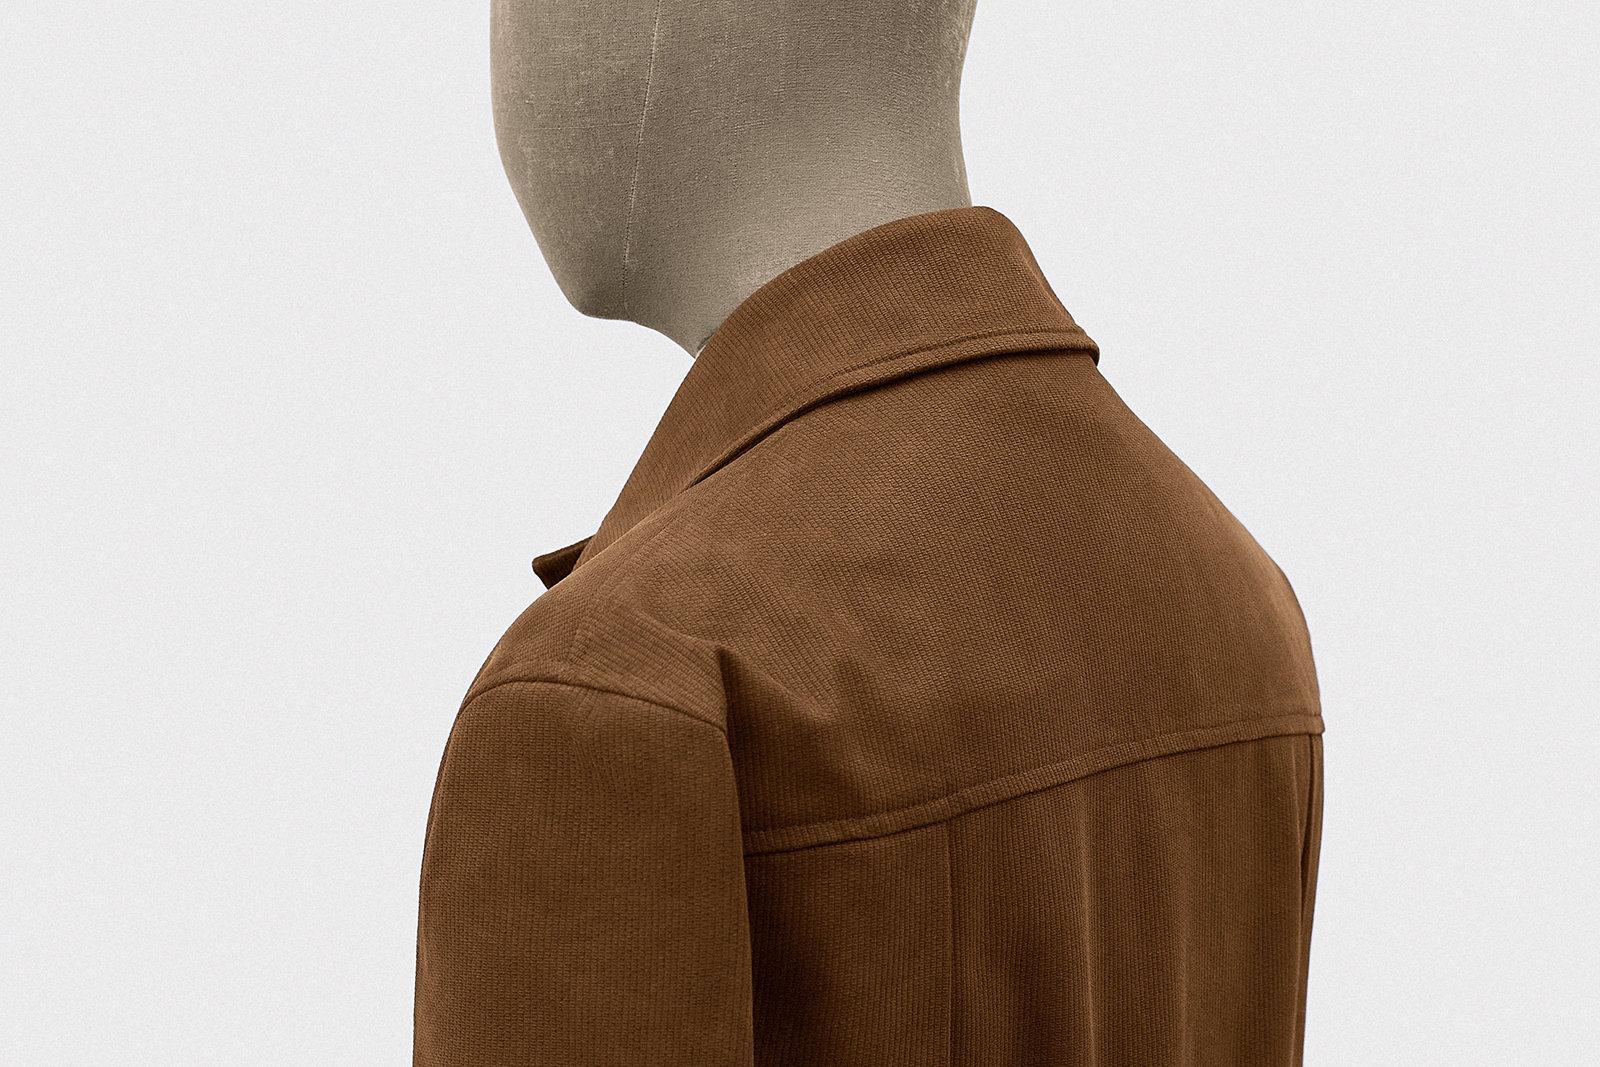 trucker-jacket-bedford-cord-rust-9@2x.jpg